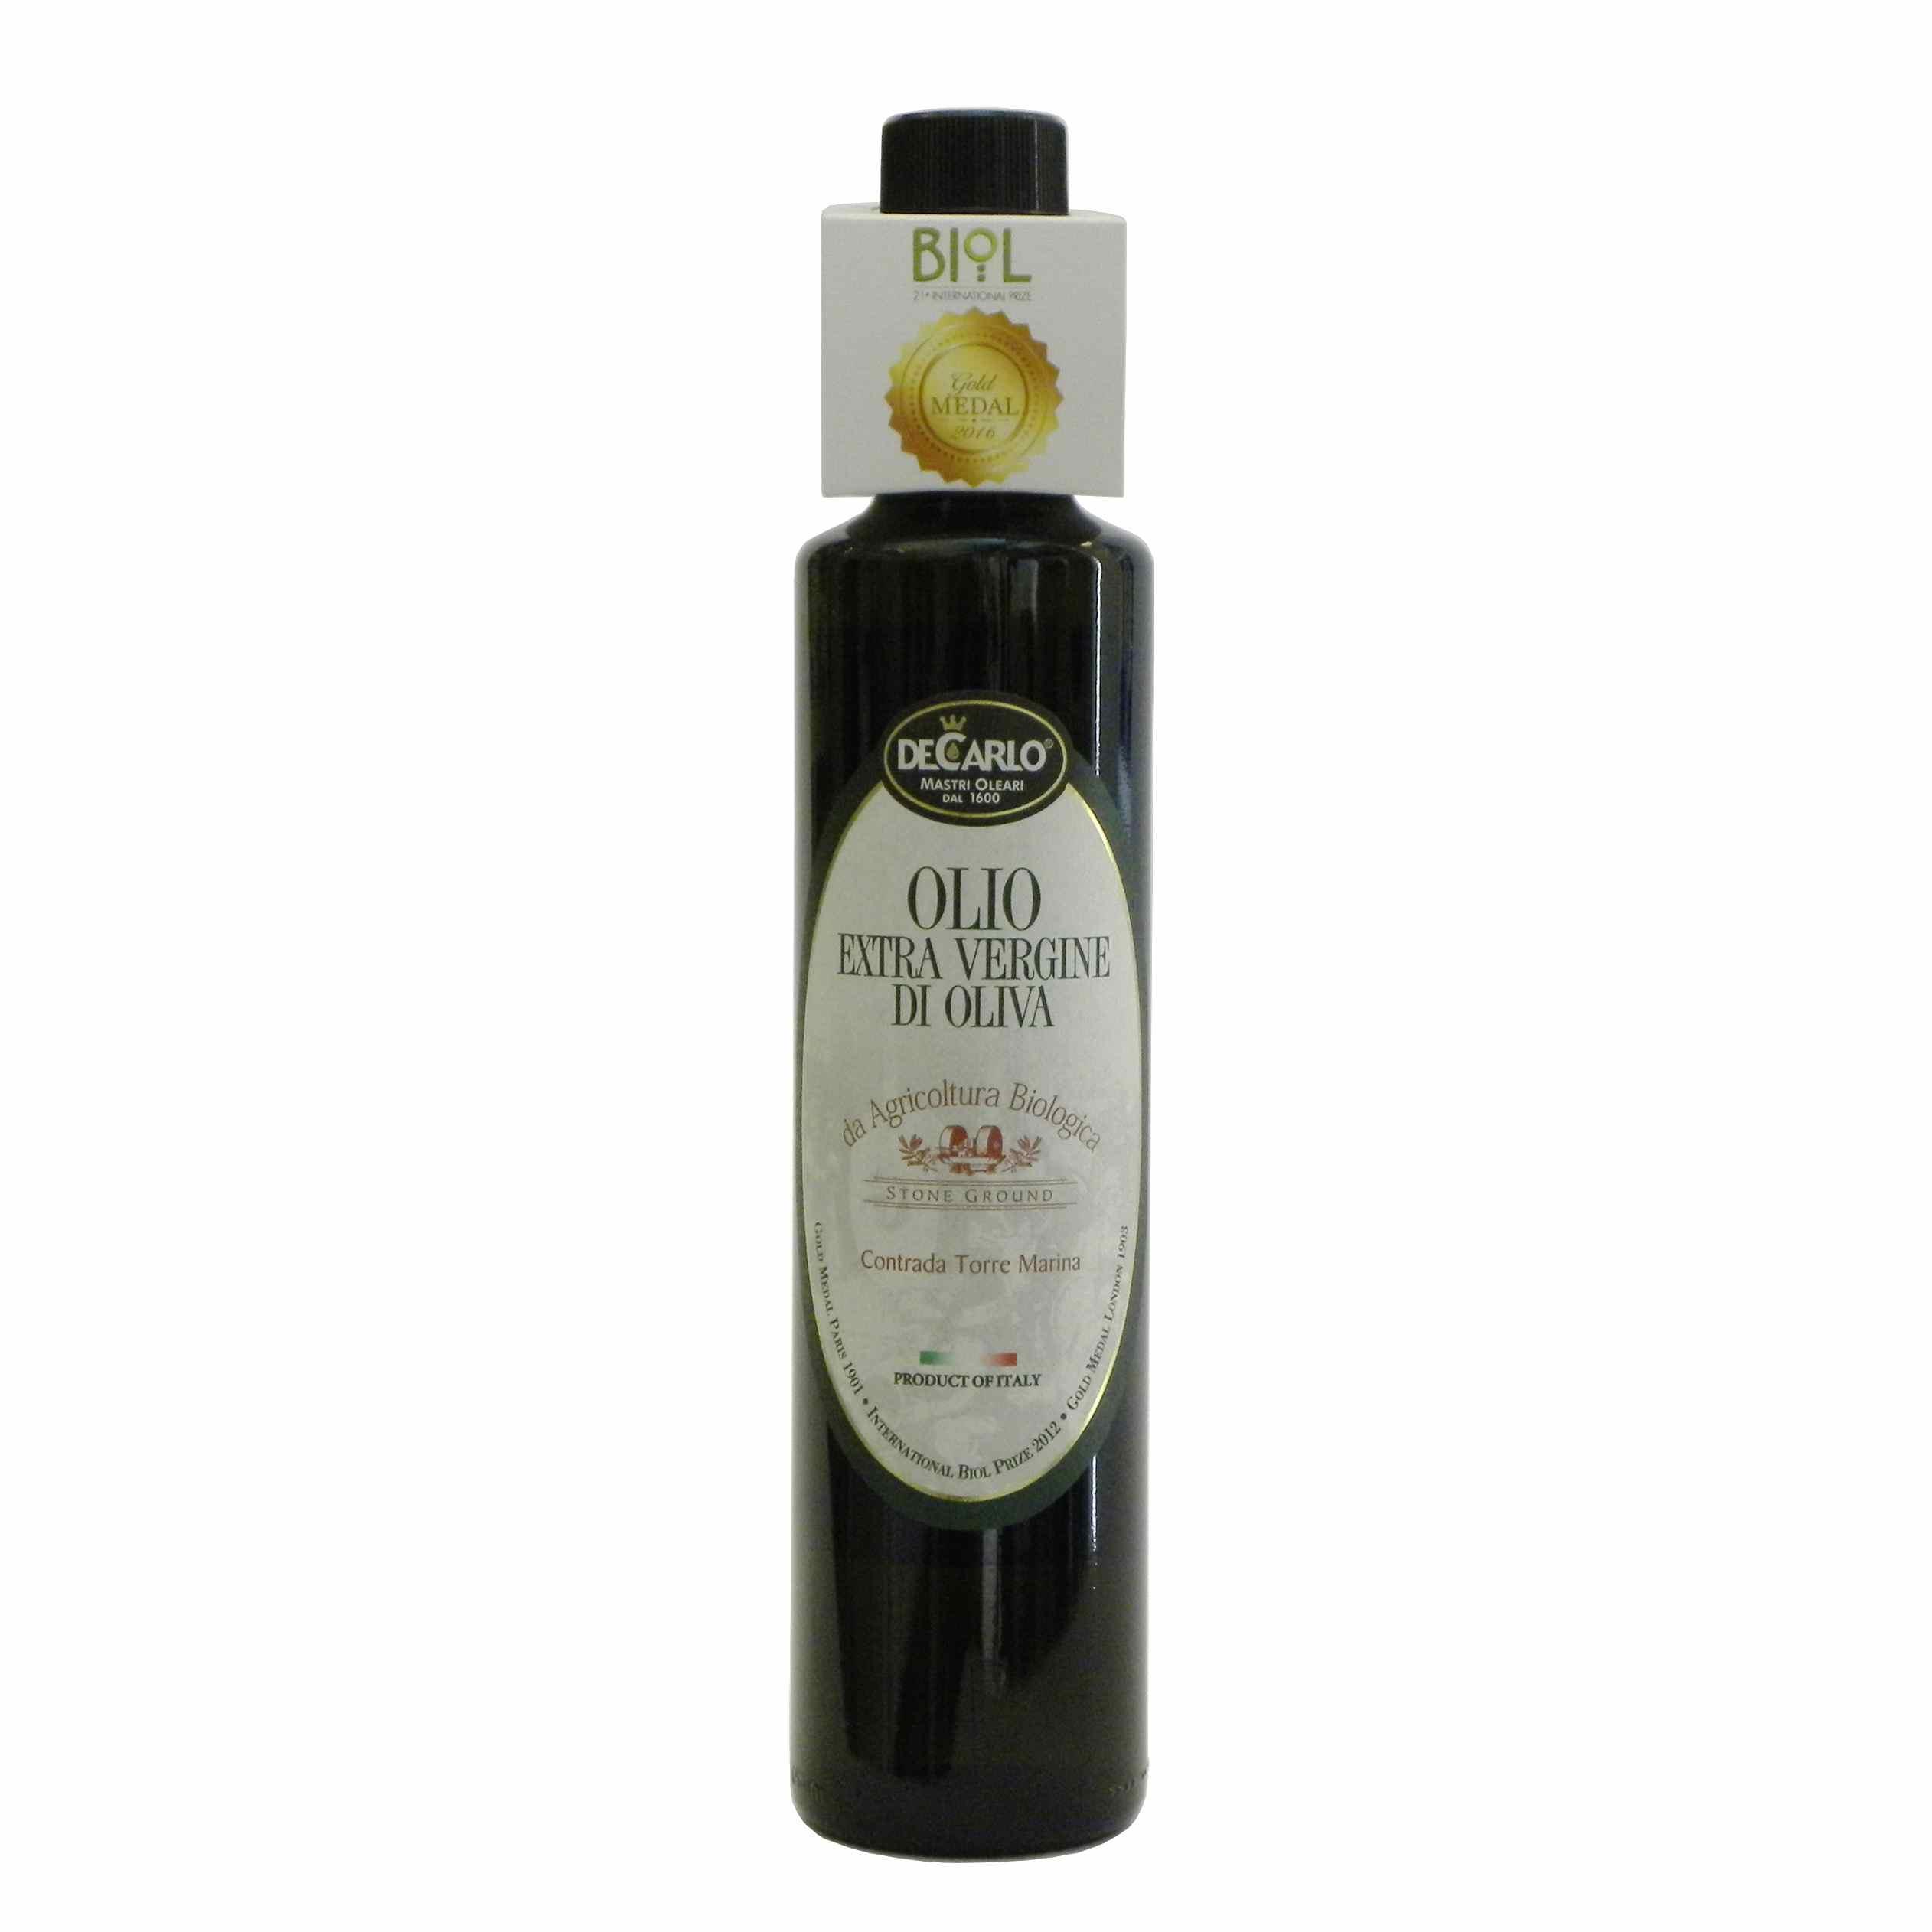 De Carlo Olio Extravergine Bio – De Carlo Organic Extra Virgin Olive Oil – Gustorotondo – Italian food boutique